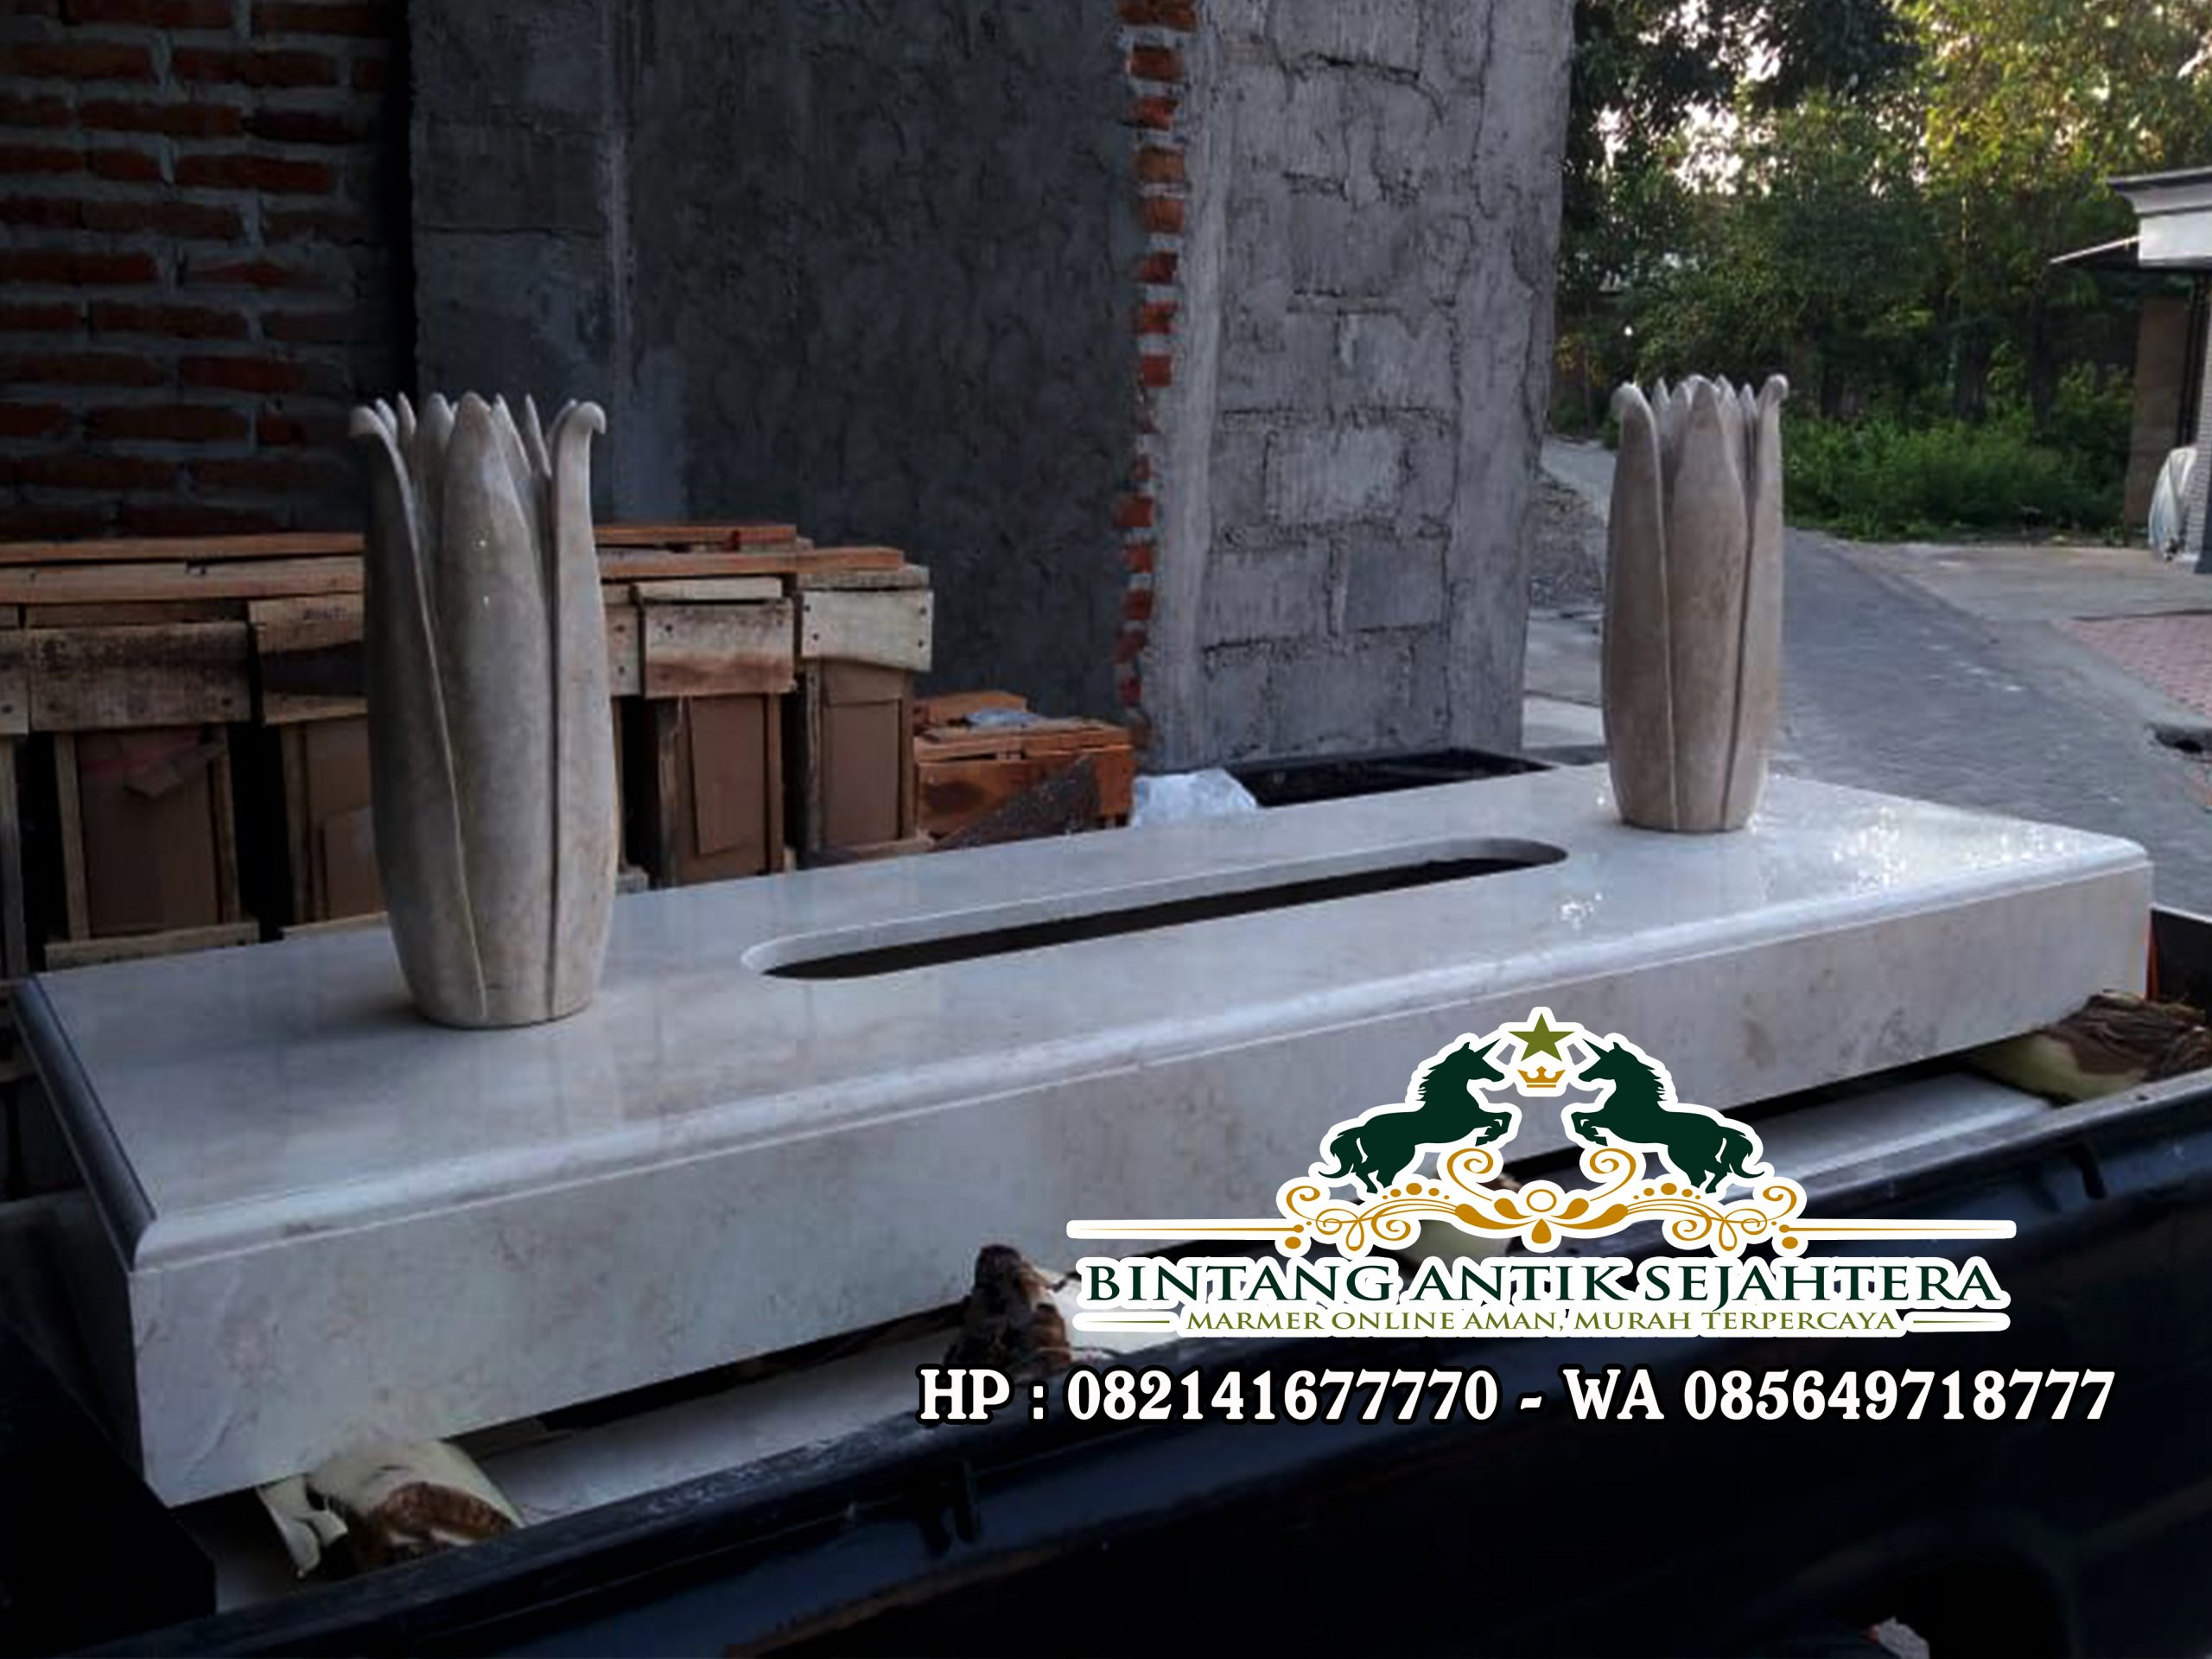 Harga Bodi Makam Marmer | Jual Makam Marmer di Bandung